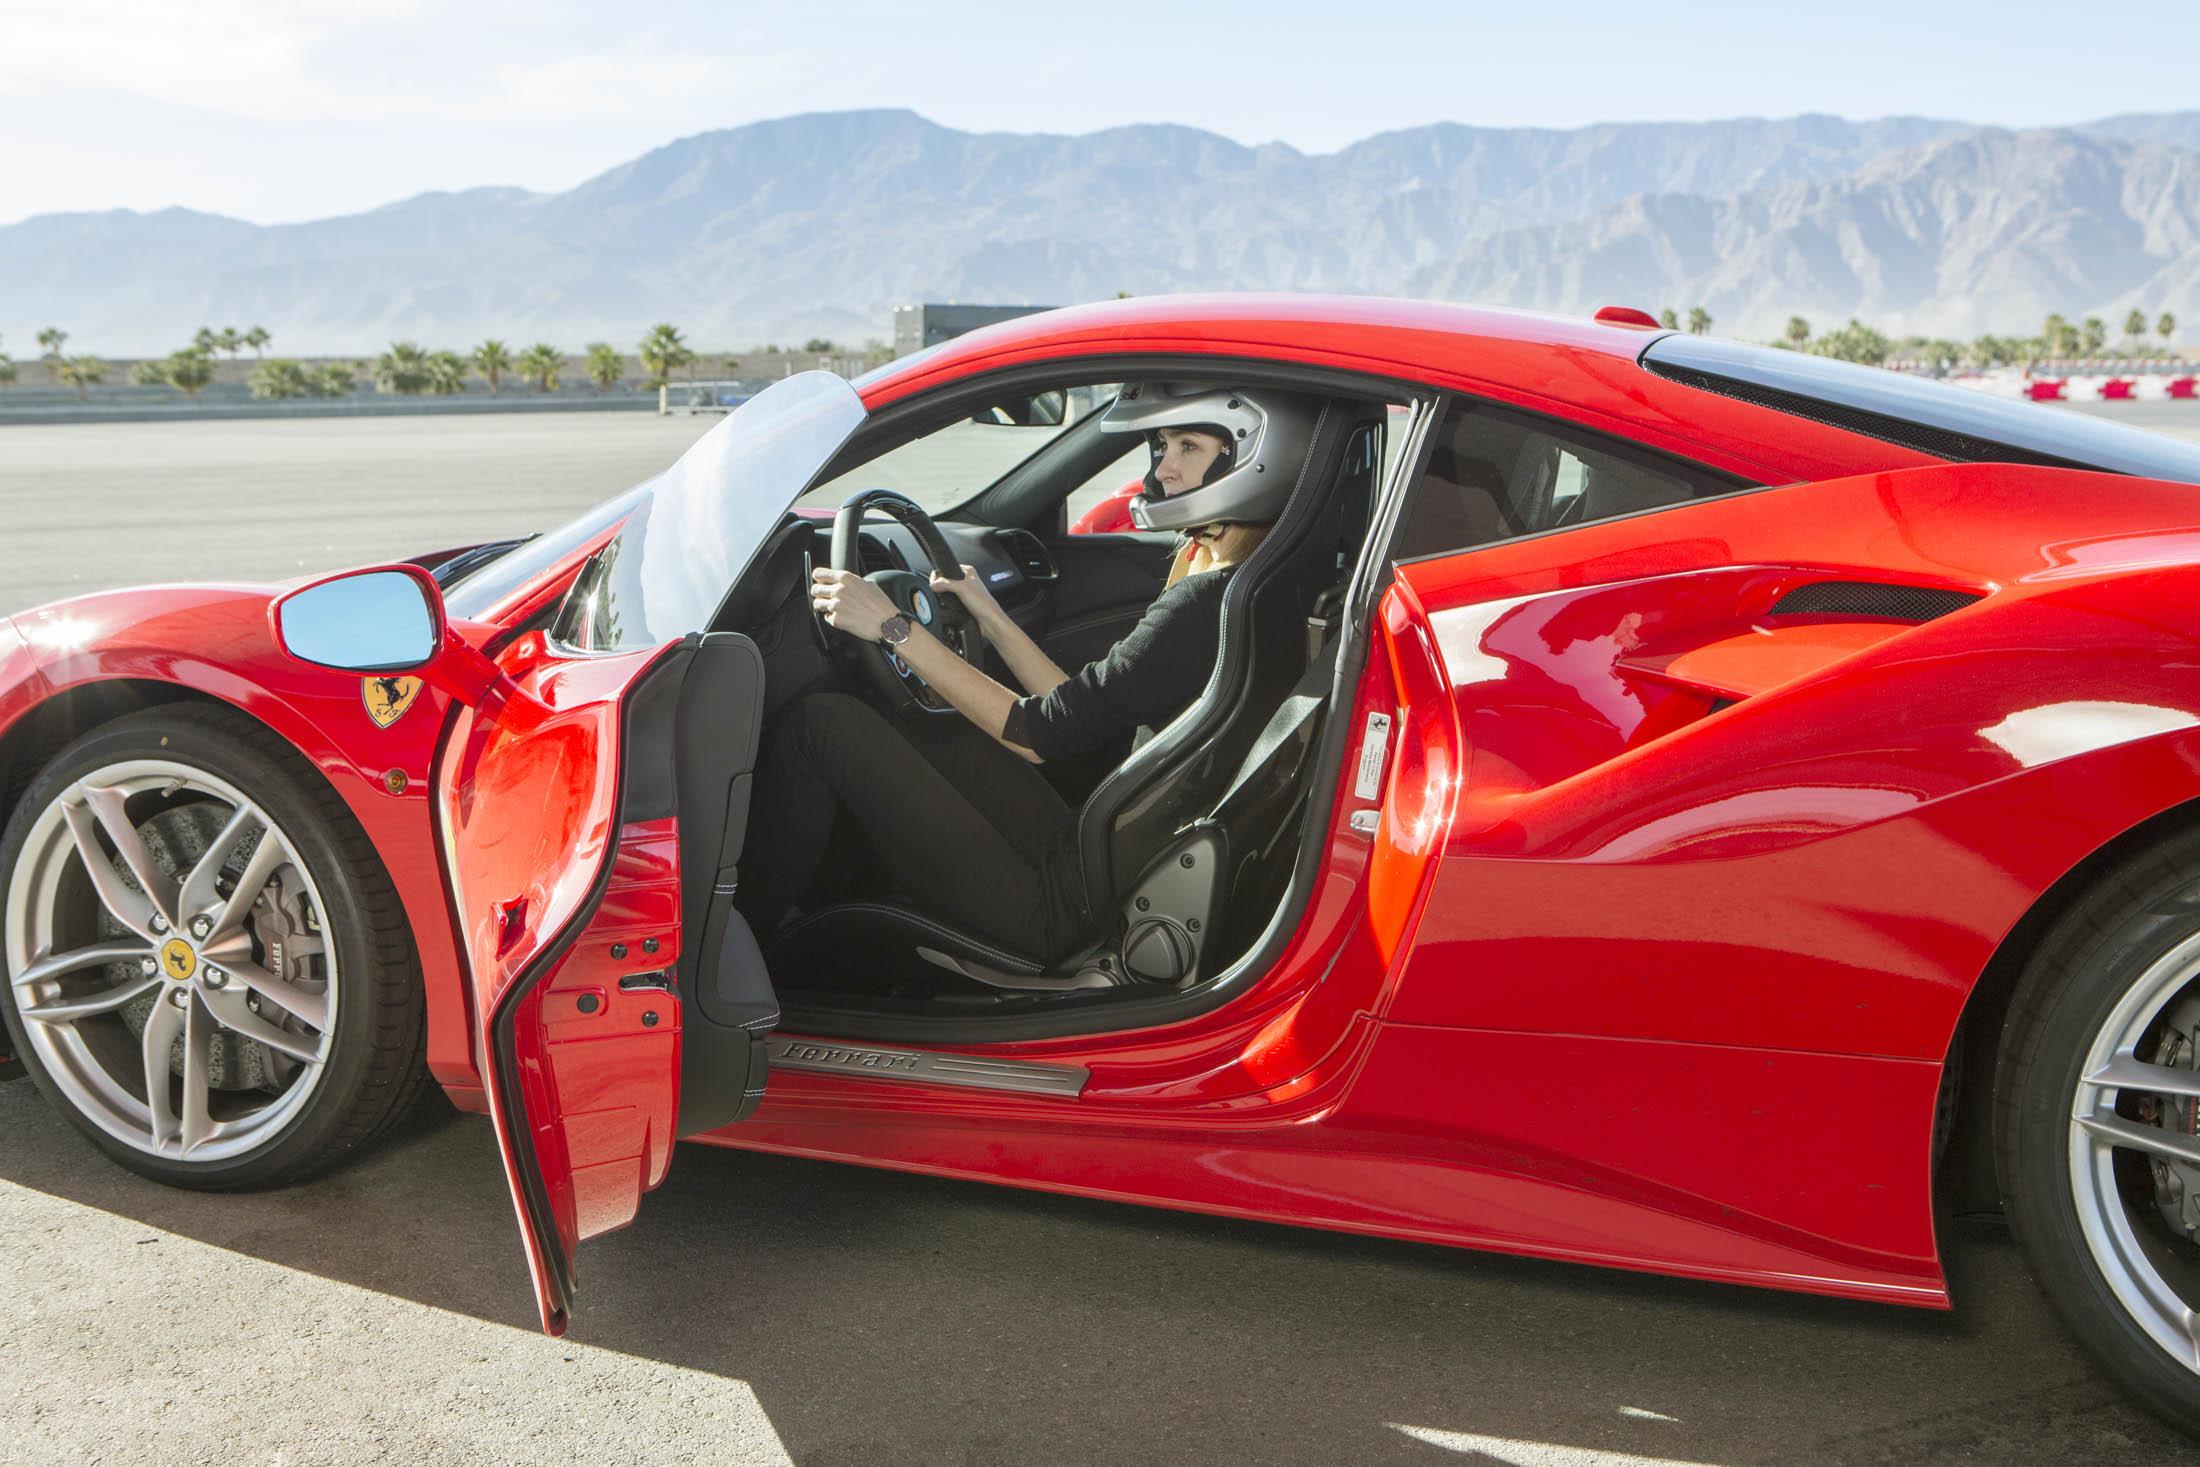 Ferrari Corso Pilota Racetrack Driving Courses Bloomberg